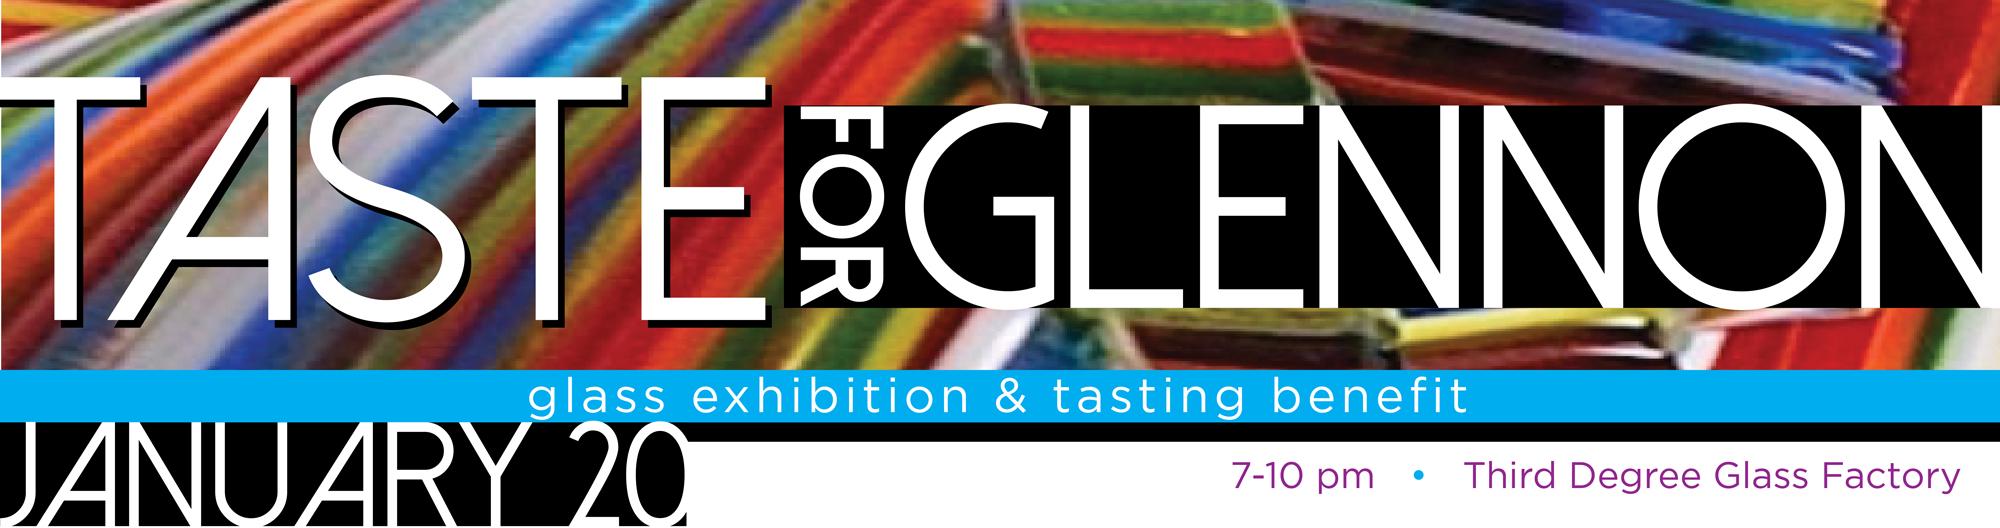 Taste for Glennon - Saturday, January 20 at Third Degree Glass Factory